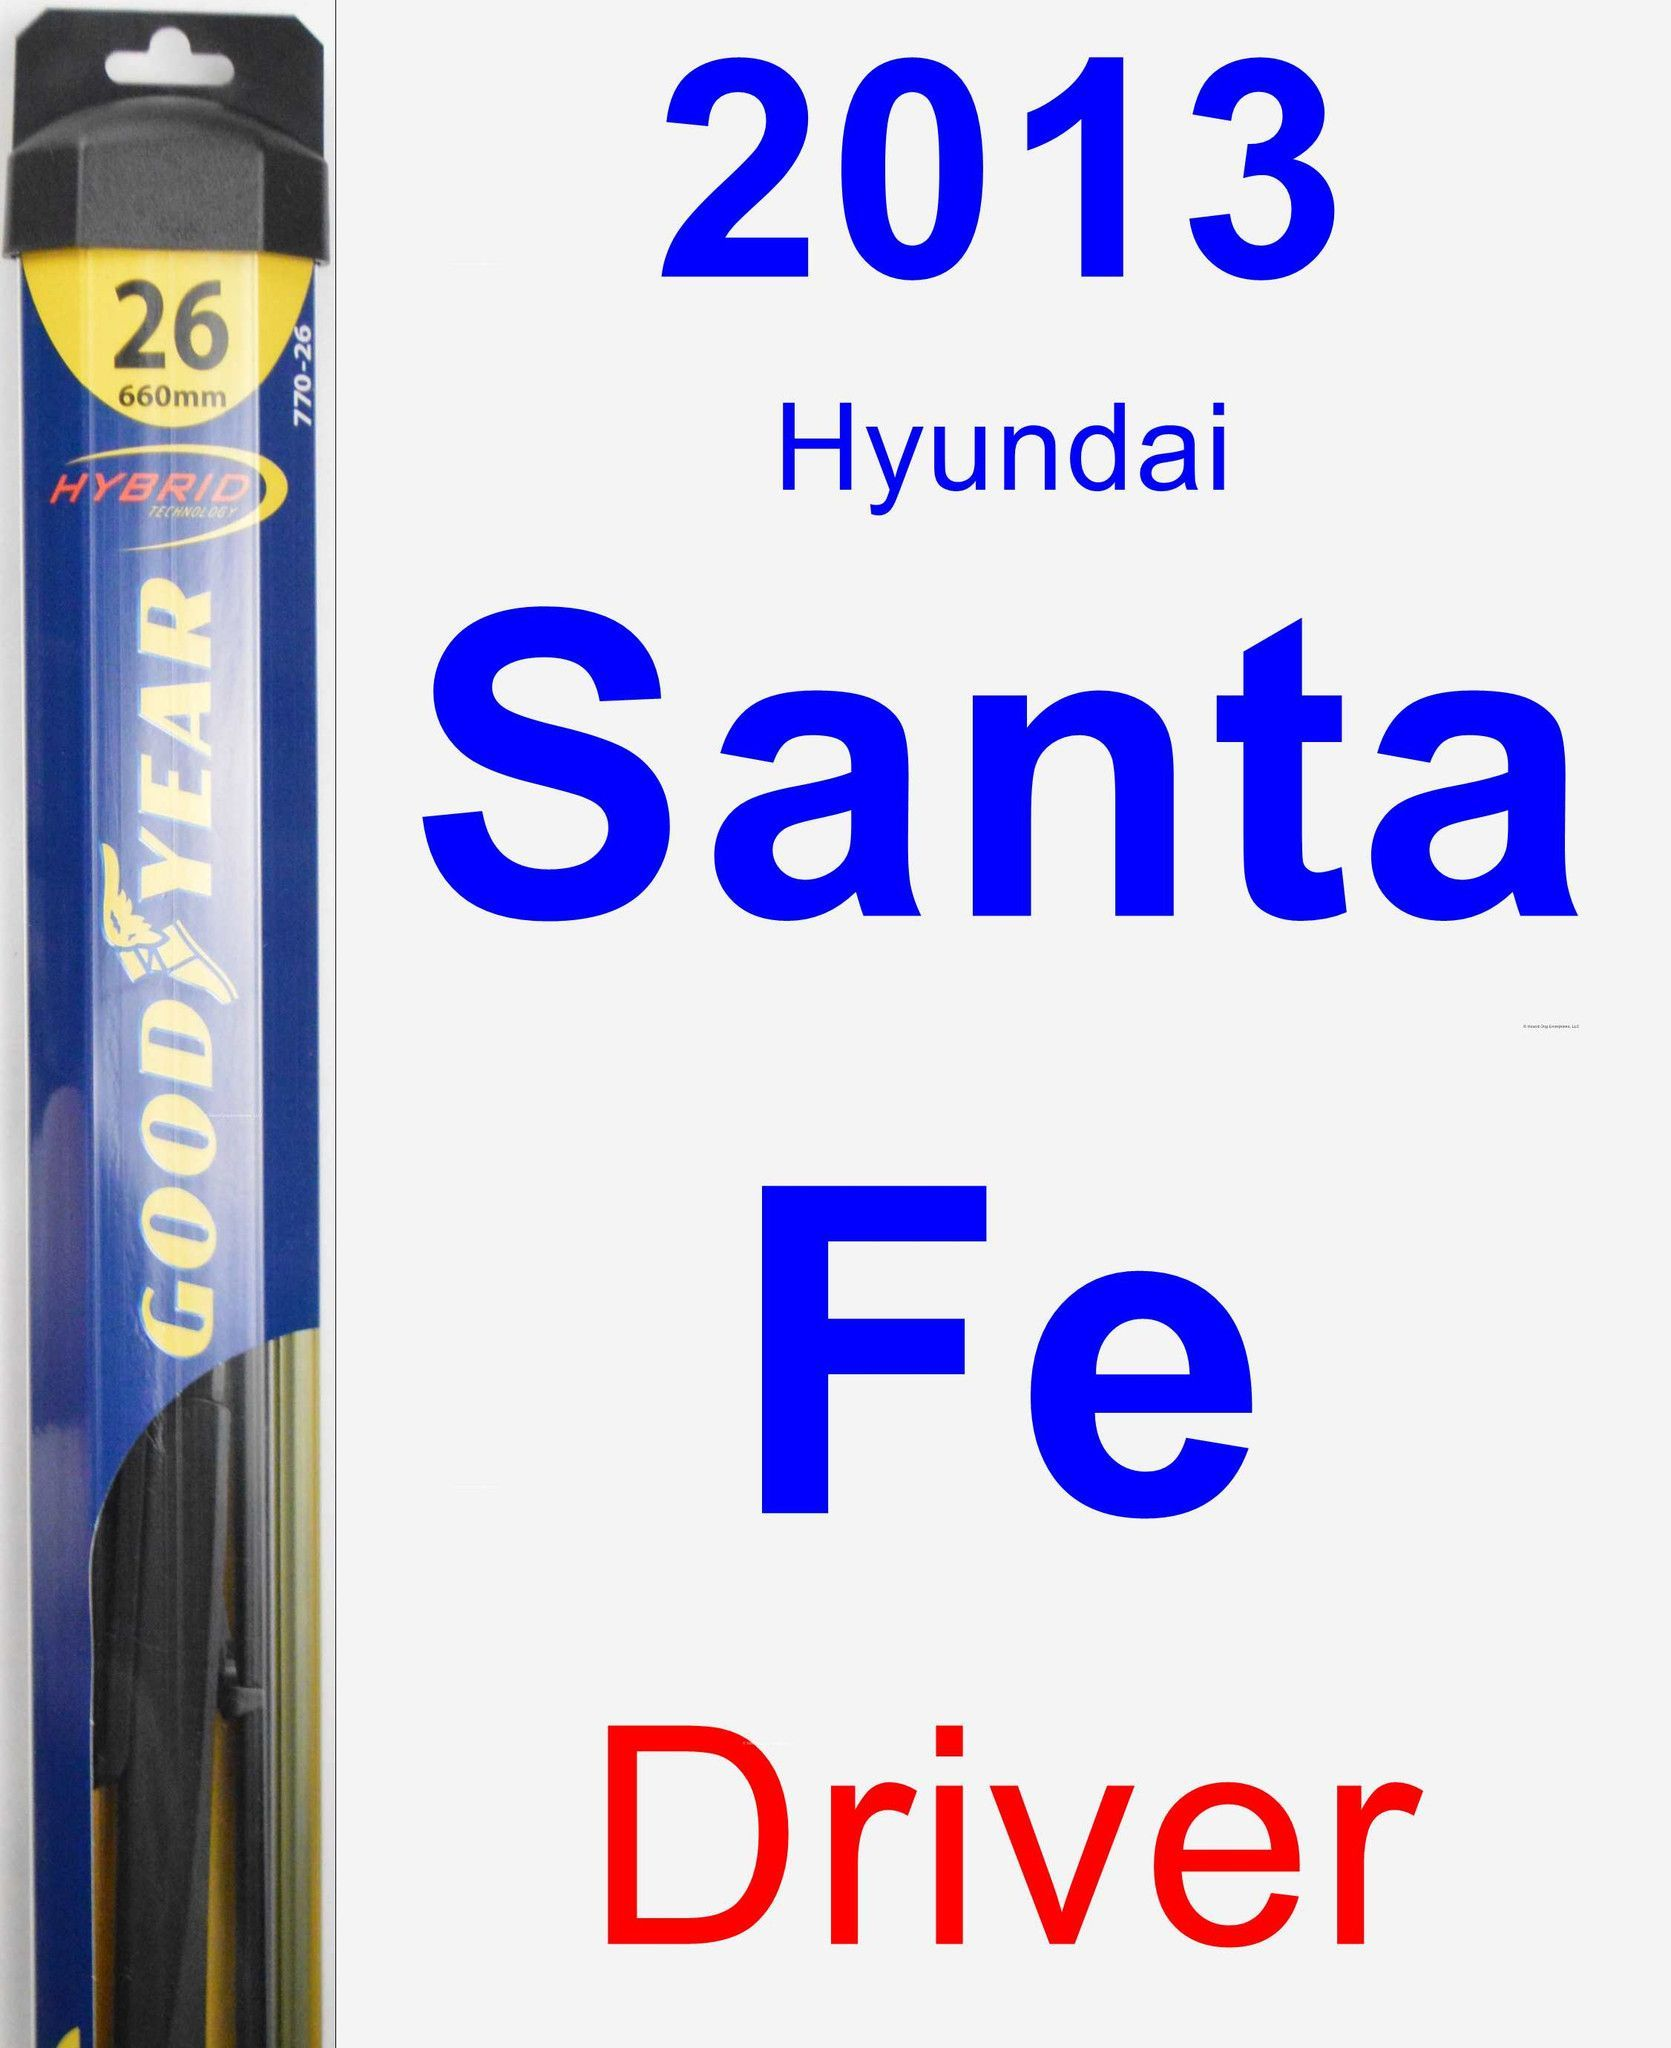 Driver Wiper Blade for 2013 Hyundai Santa Fe Hybrid